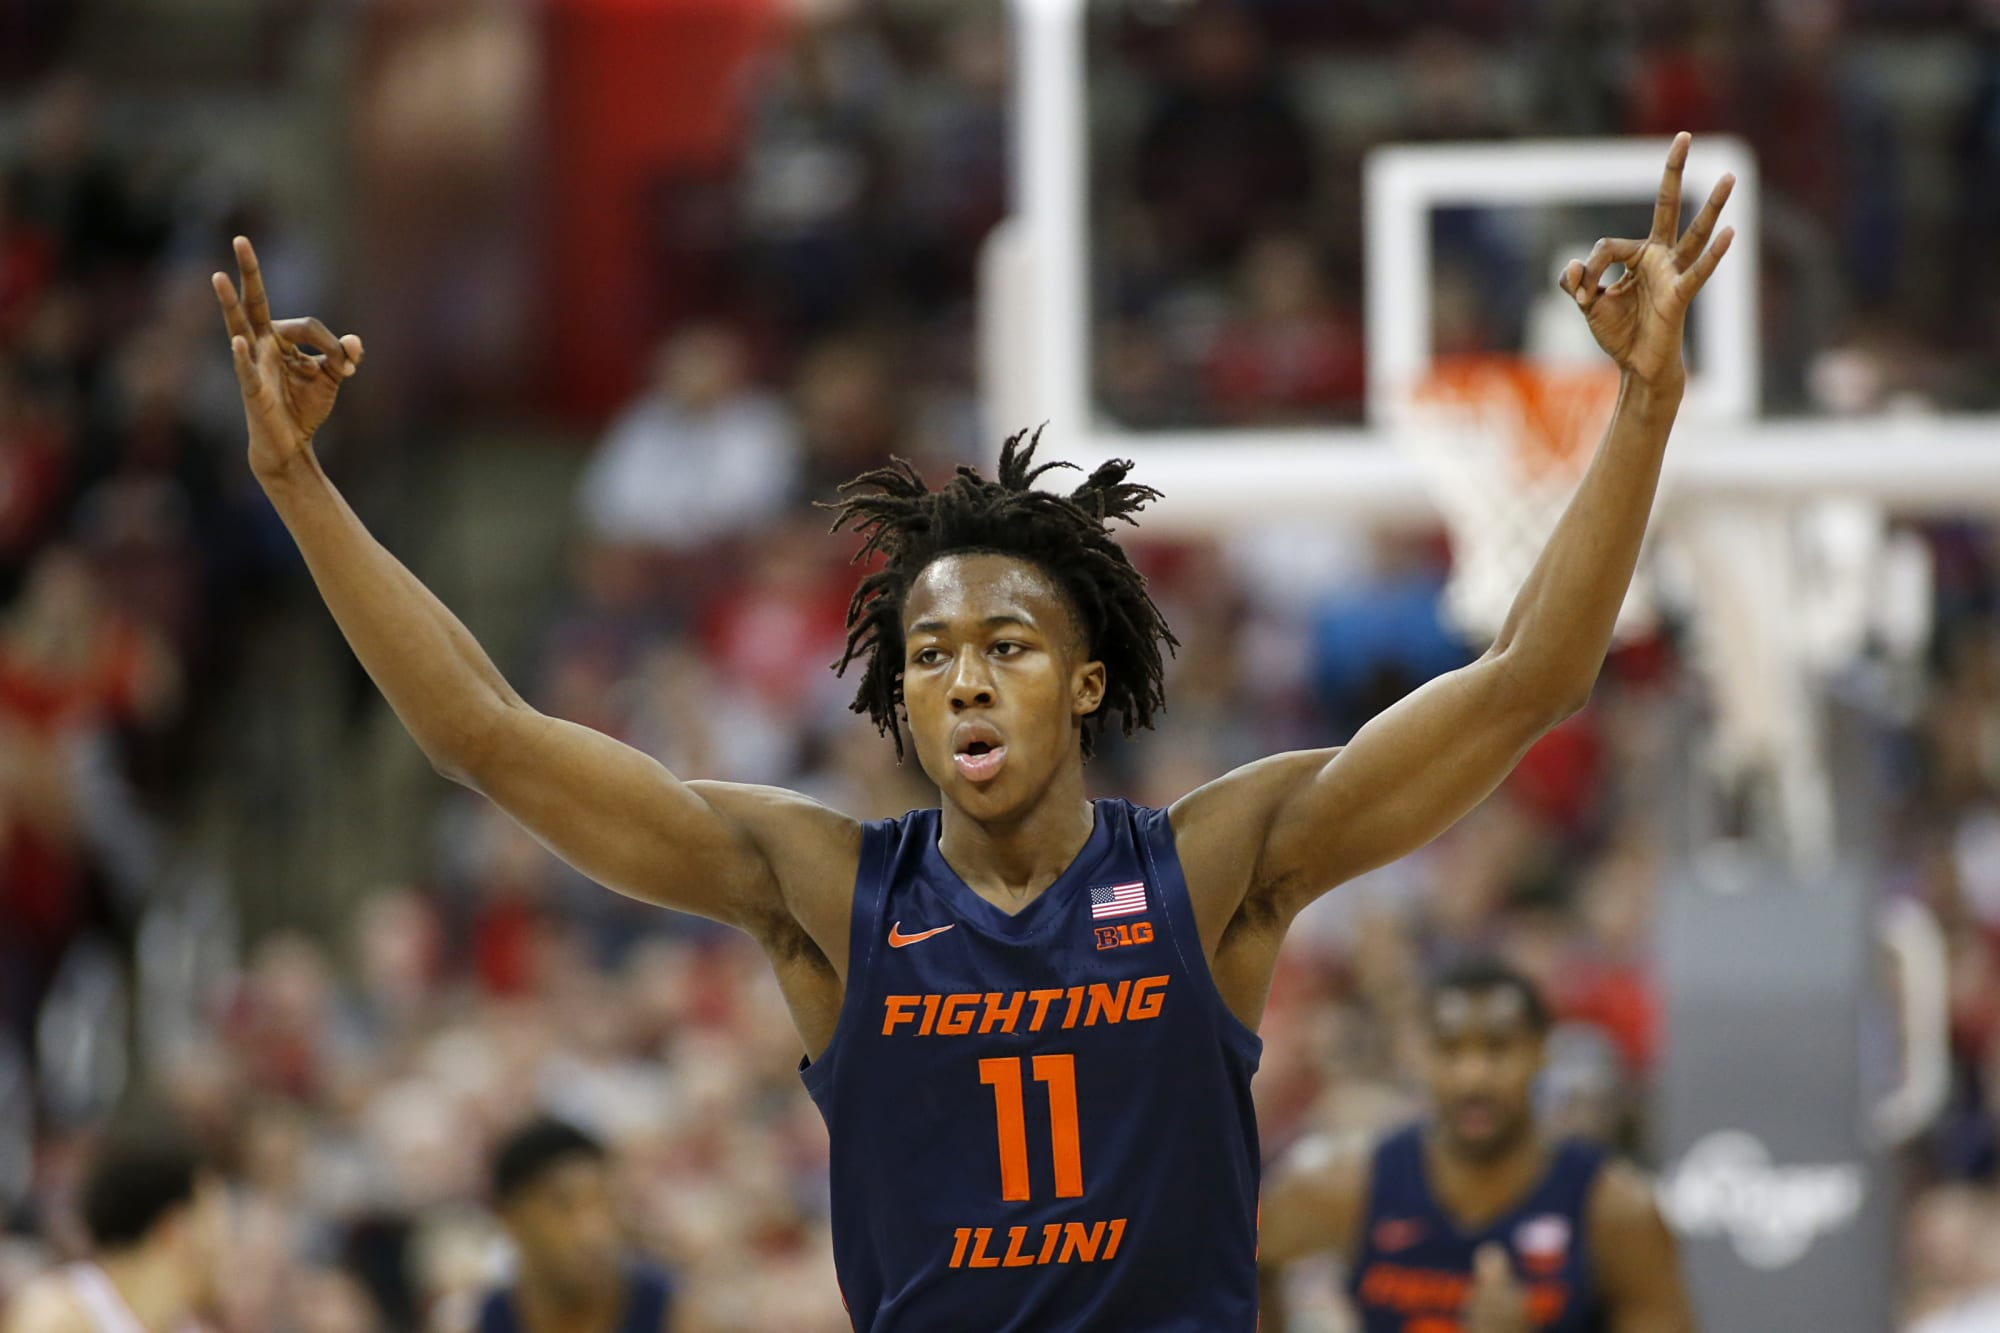 Illinois Basketball: Illini report card against the Duke Blue Devils